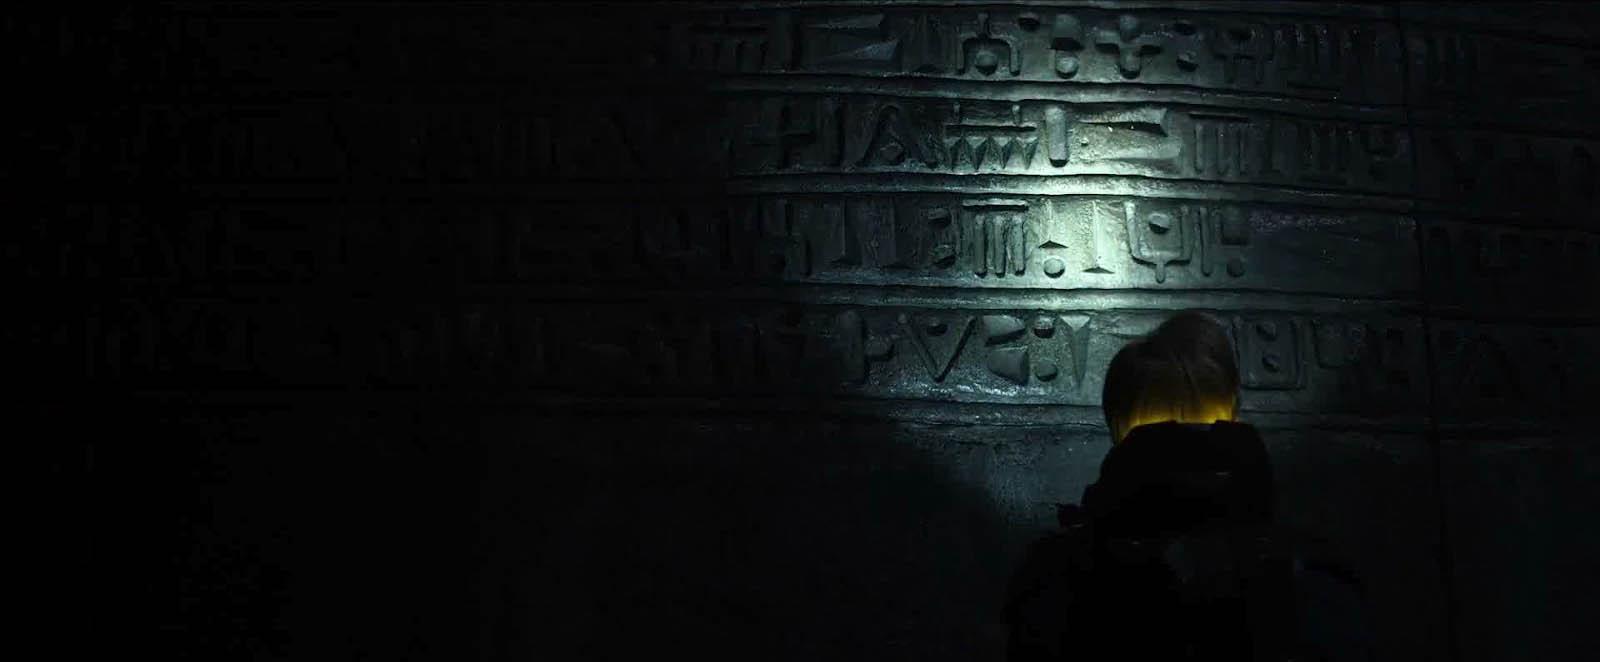 Image engineer temple hieroglyphs png xenopedia for Prometheus xenomorph mural